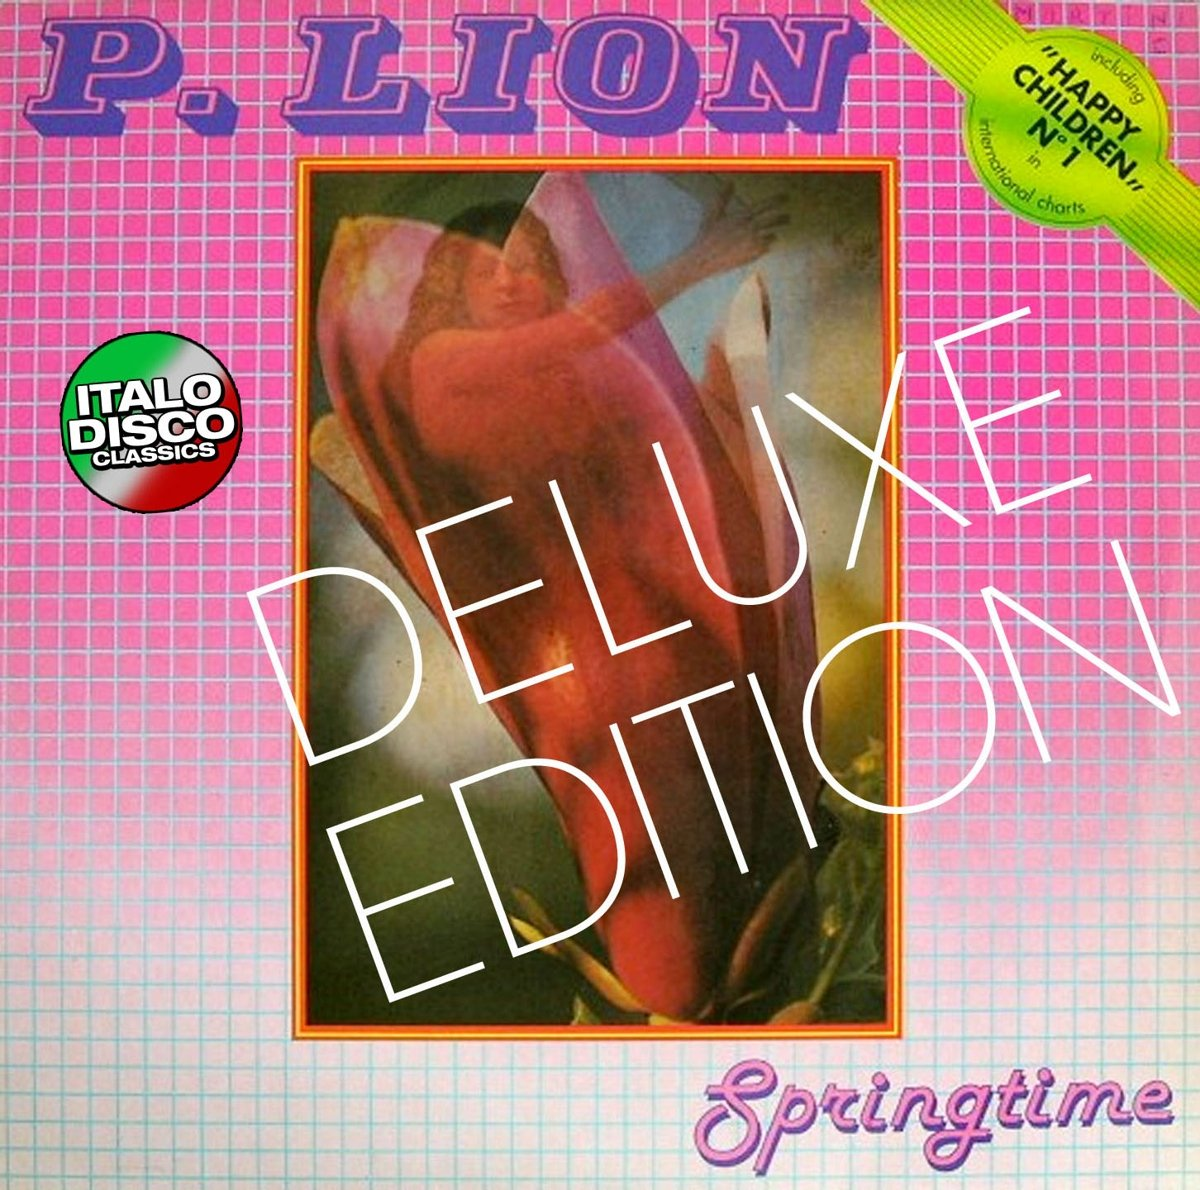 P. Lion. Springtime (Deluxe Edition)